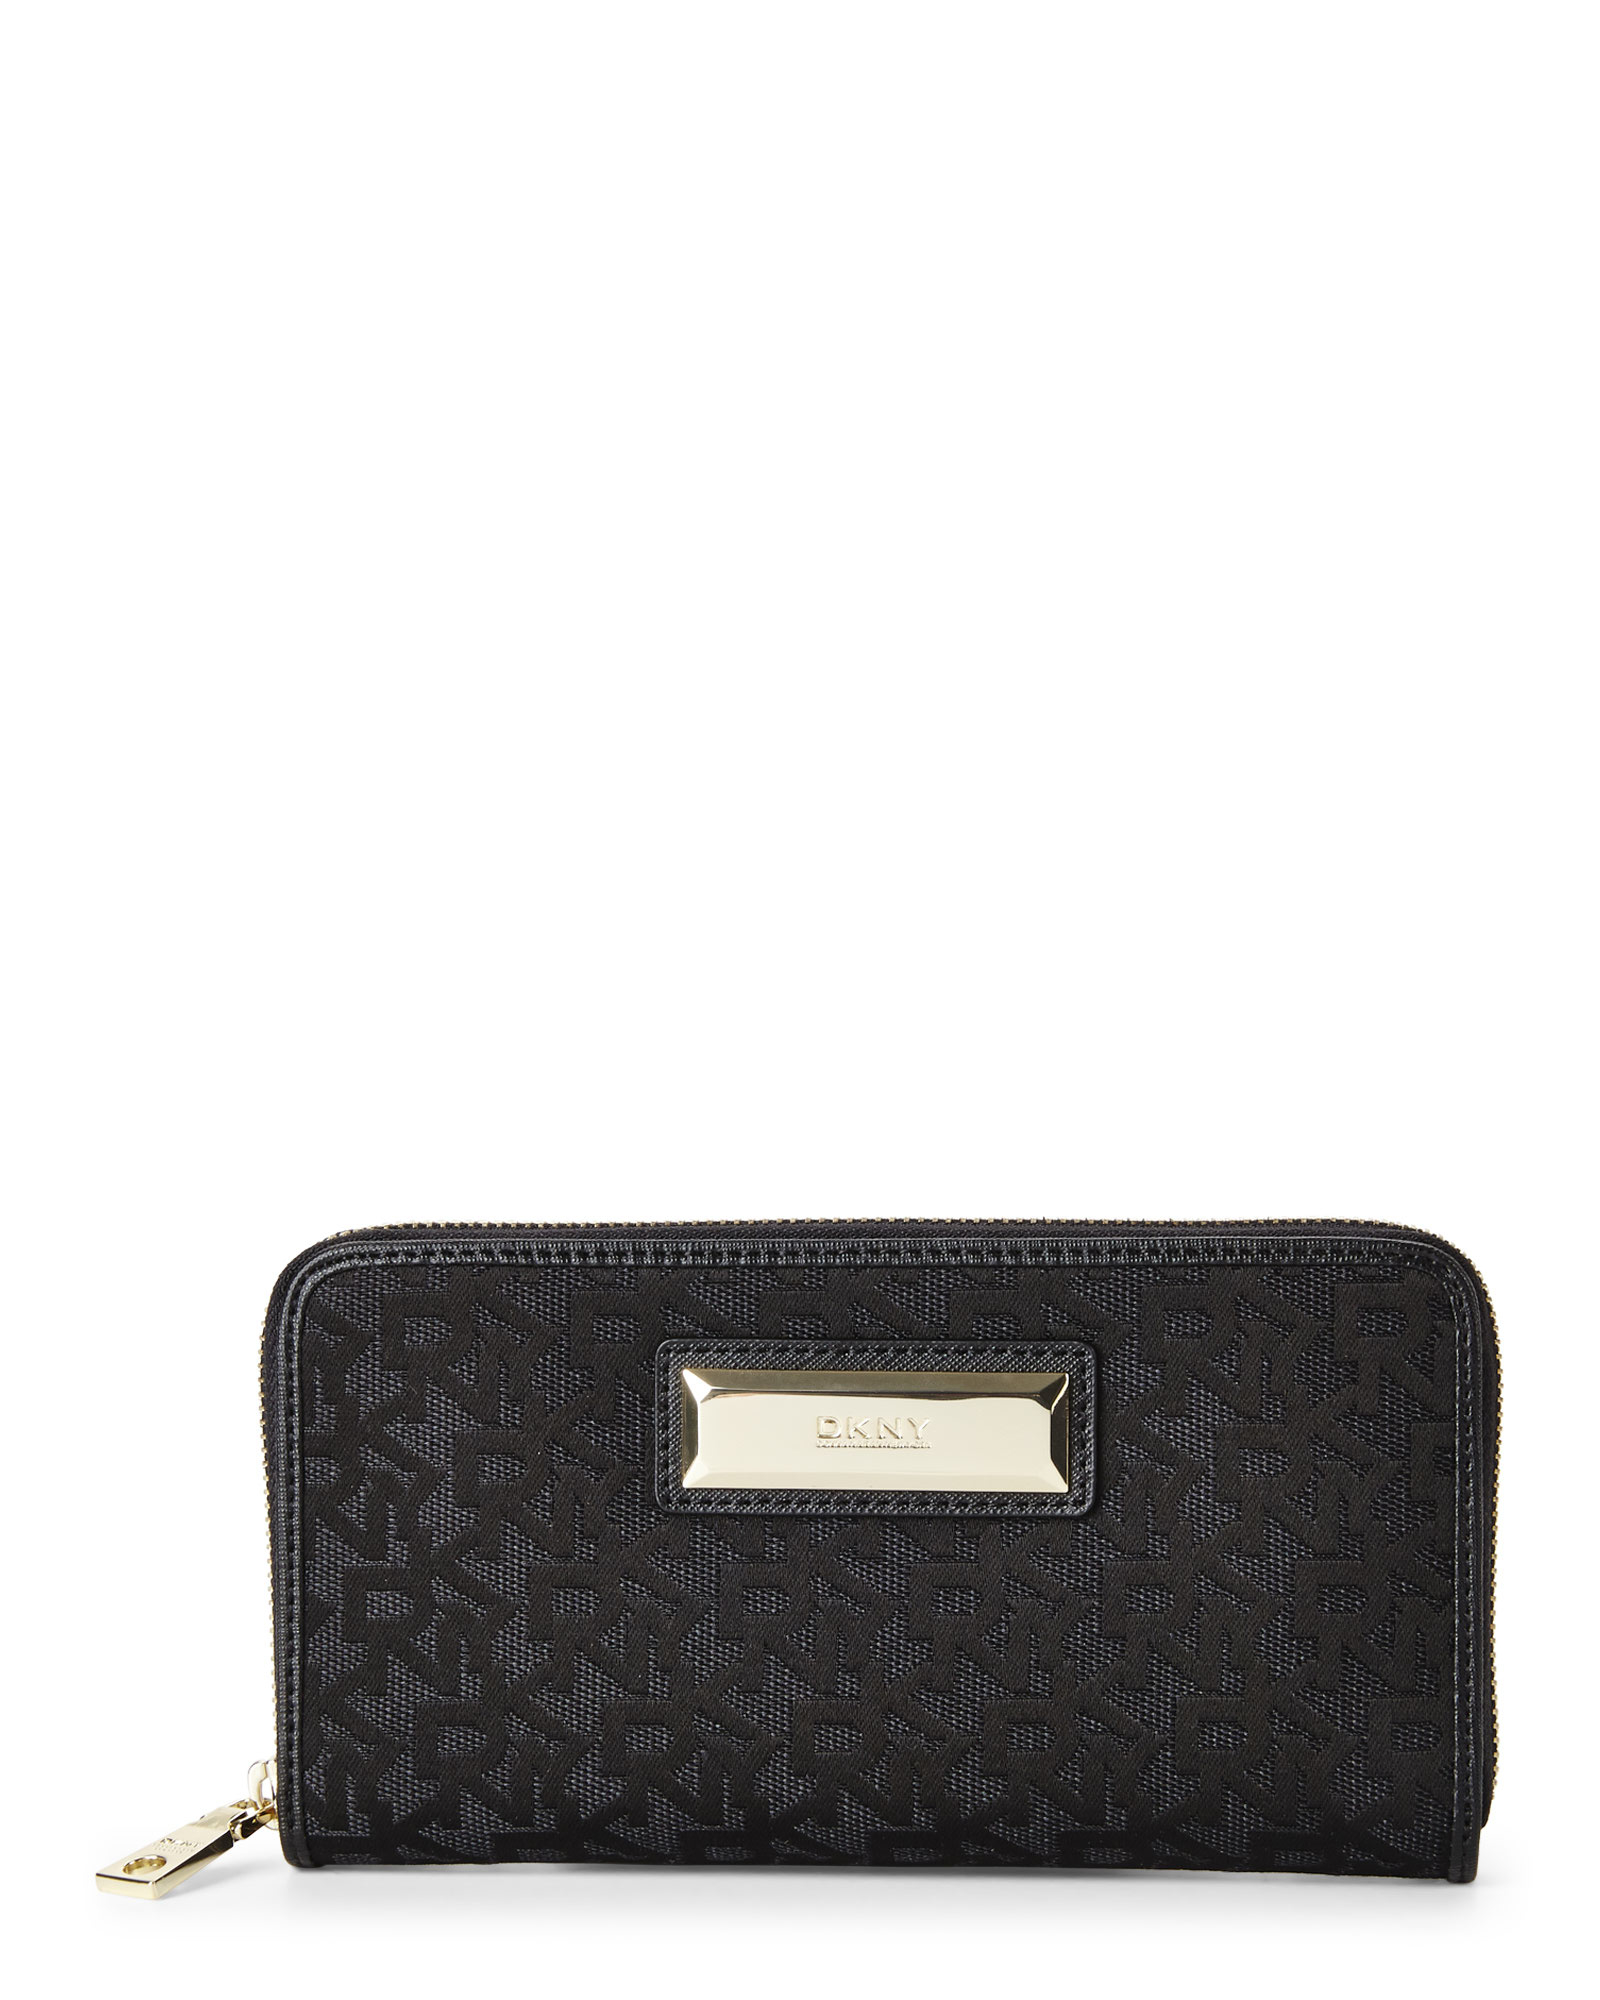 Dkny heritage black large zip around purse